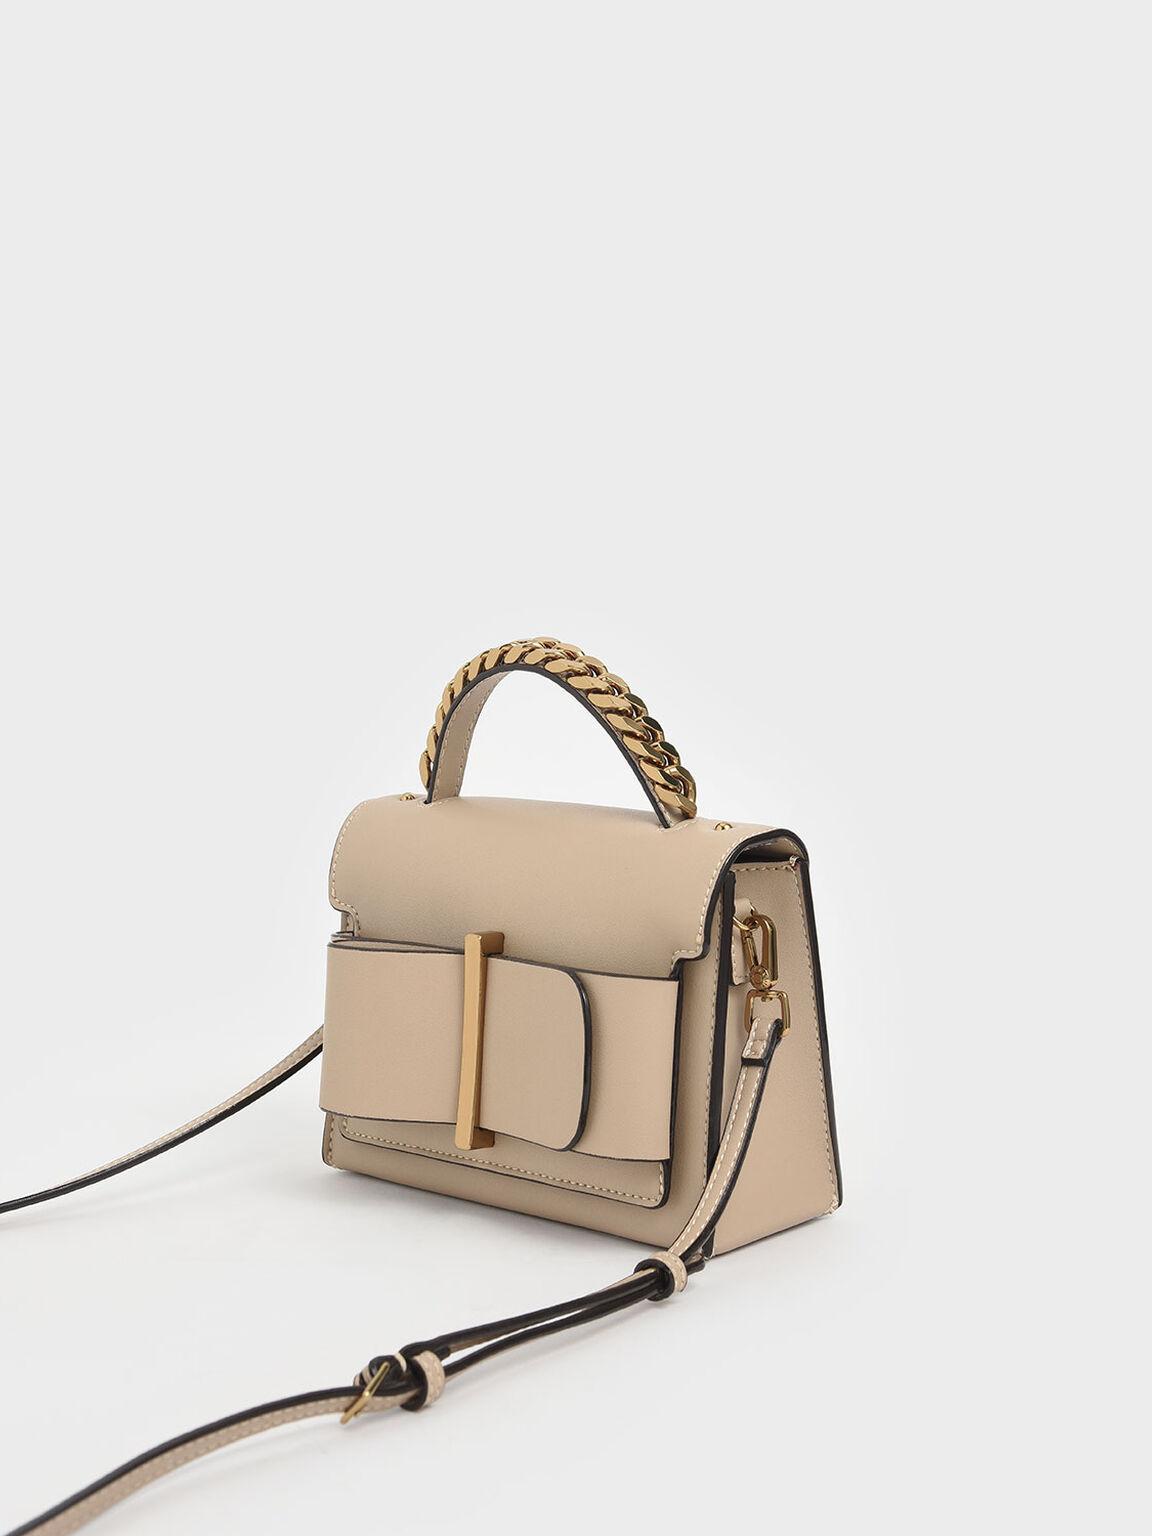 Chunky Metal Top Handle Bow Flap Bag, Beige, hi-res